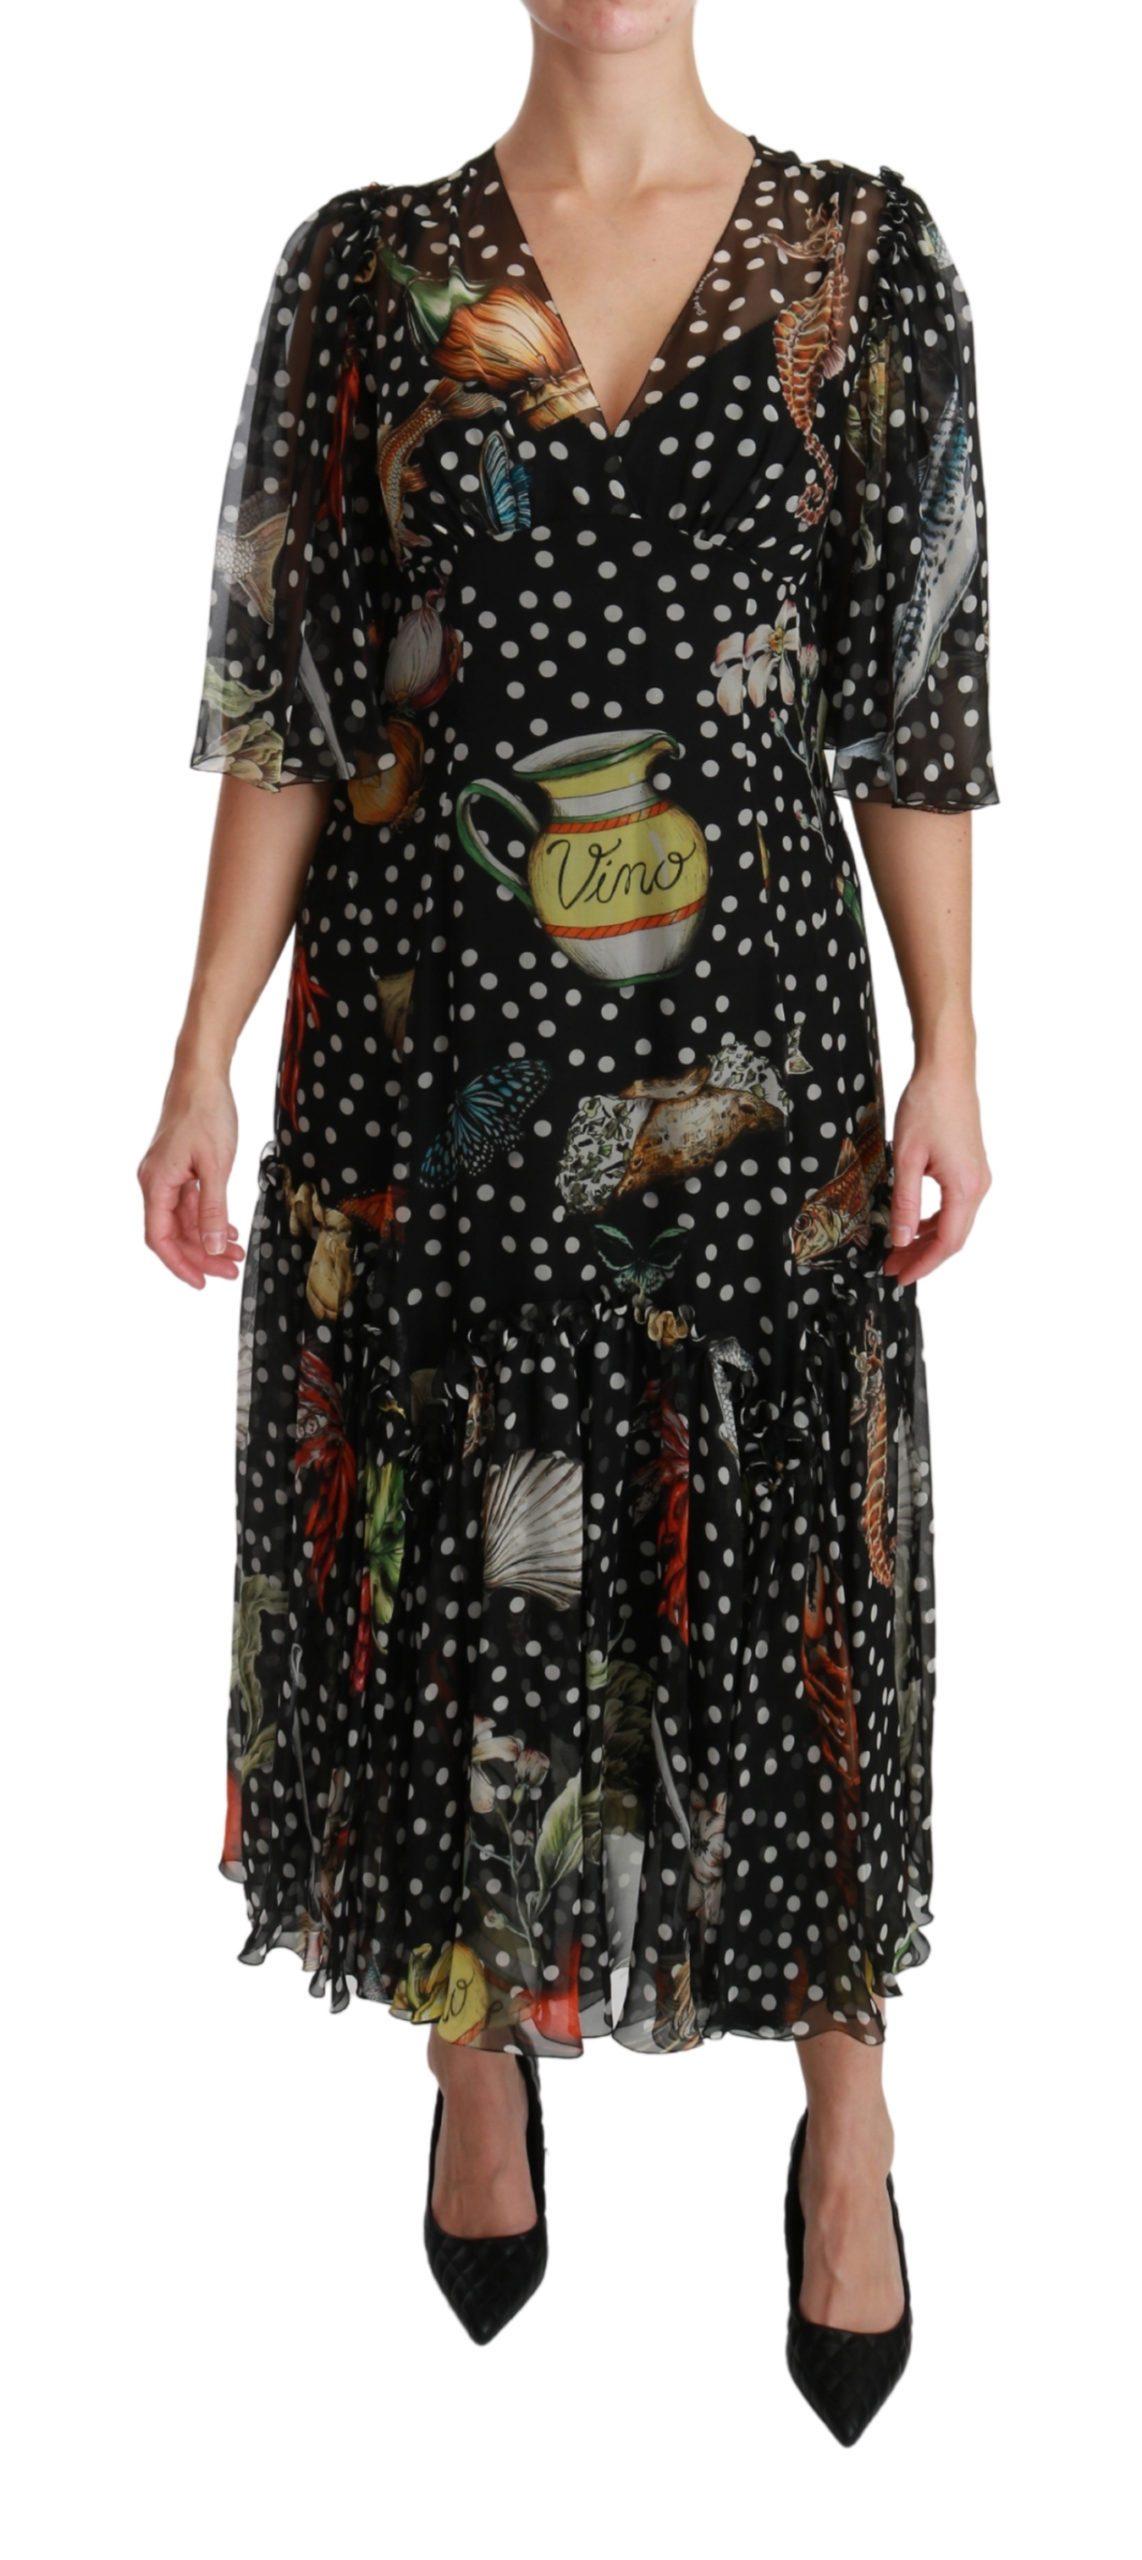 Dolce & Gabbana Women's Sea Fish Sicily A-line Shift Dress Black DR2540 - IT42|M